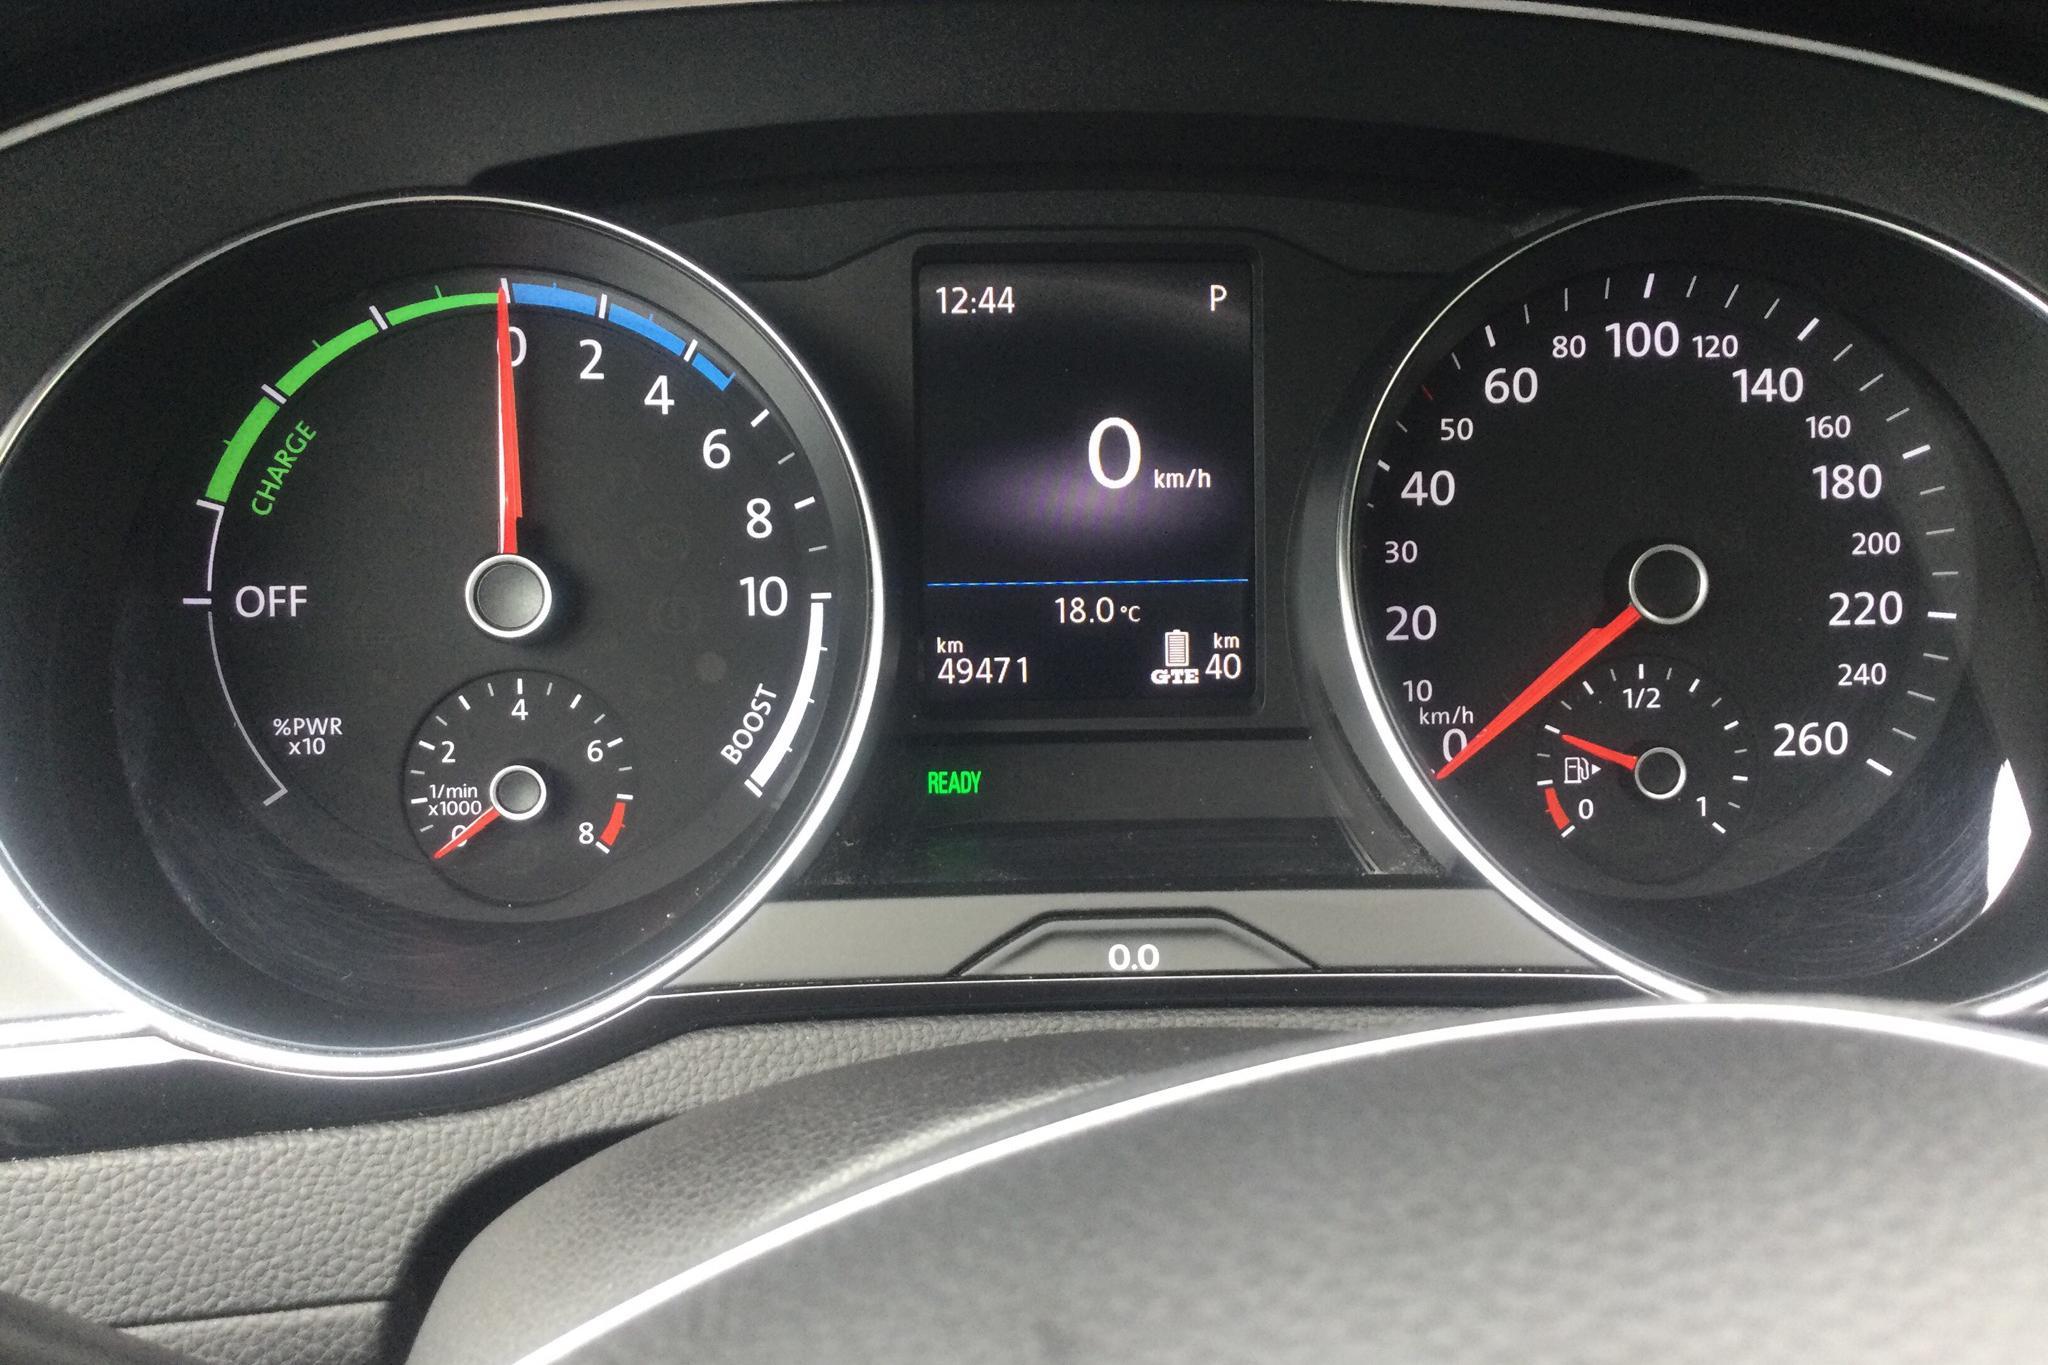 VW Passat 1.4 Plug-in-Hybrid Sportscombi (218hk) - 4 947 mil - Automat - vit - 2018